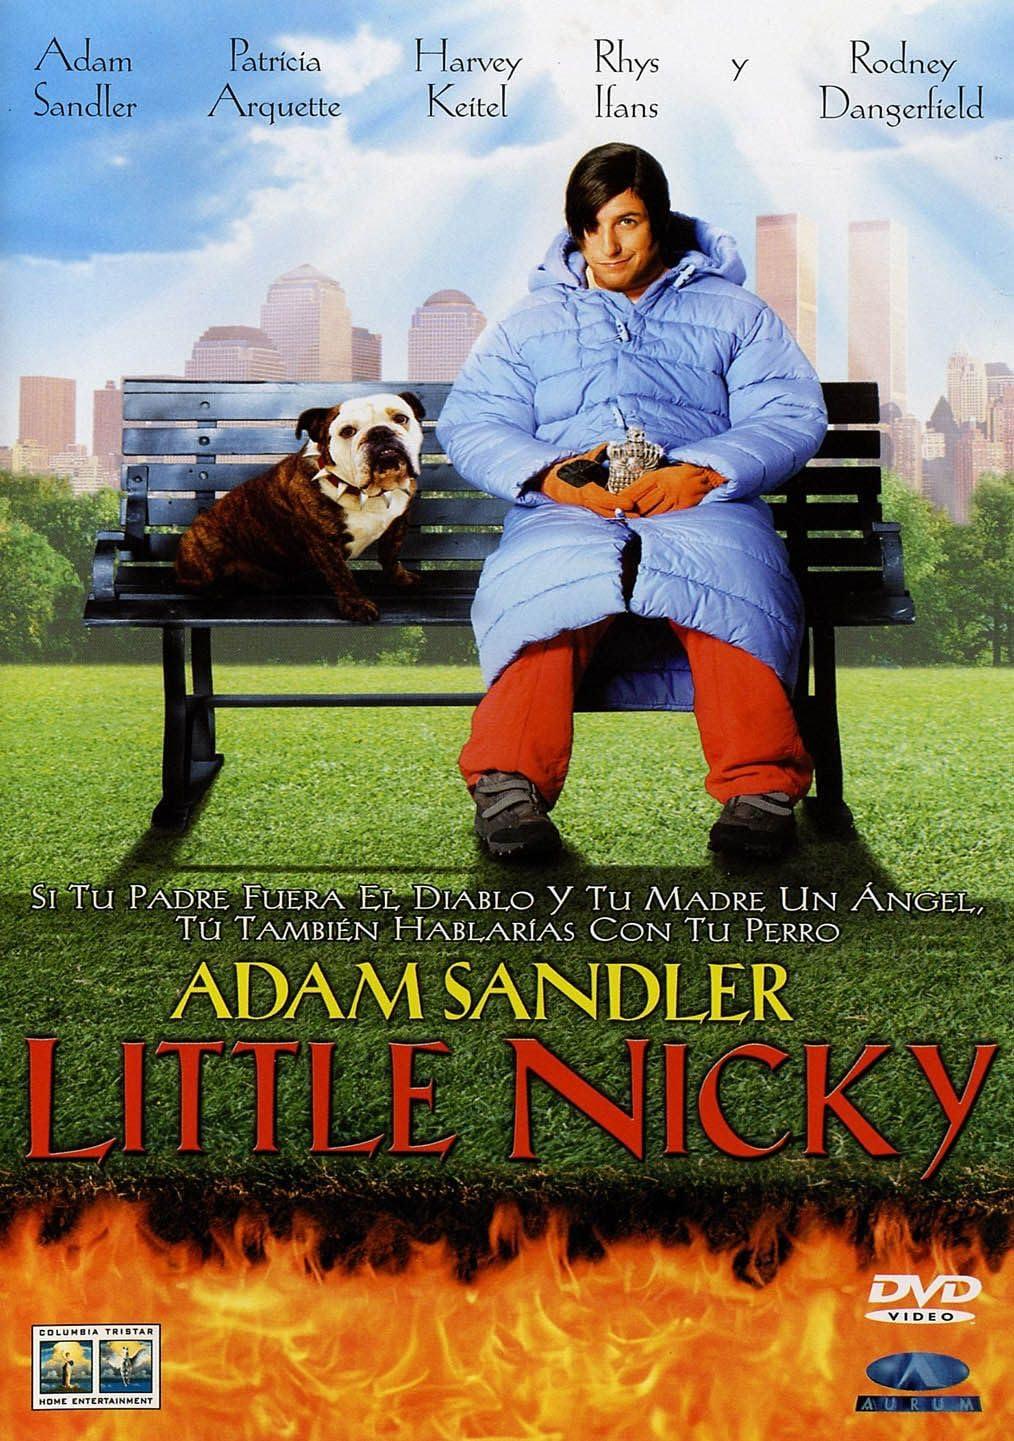 Little Nicky (2000) Hindi Dubbed